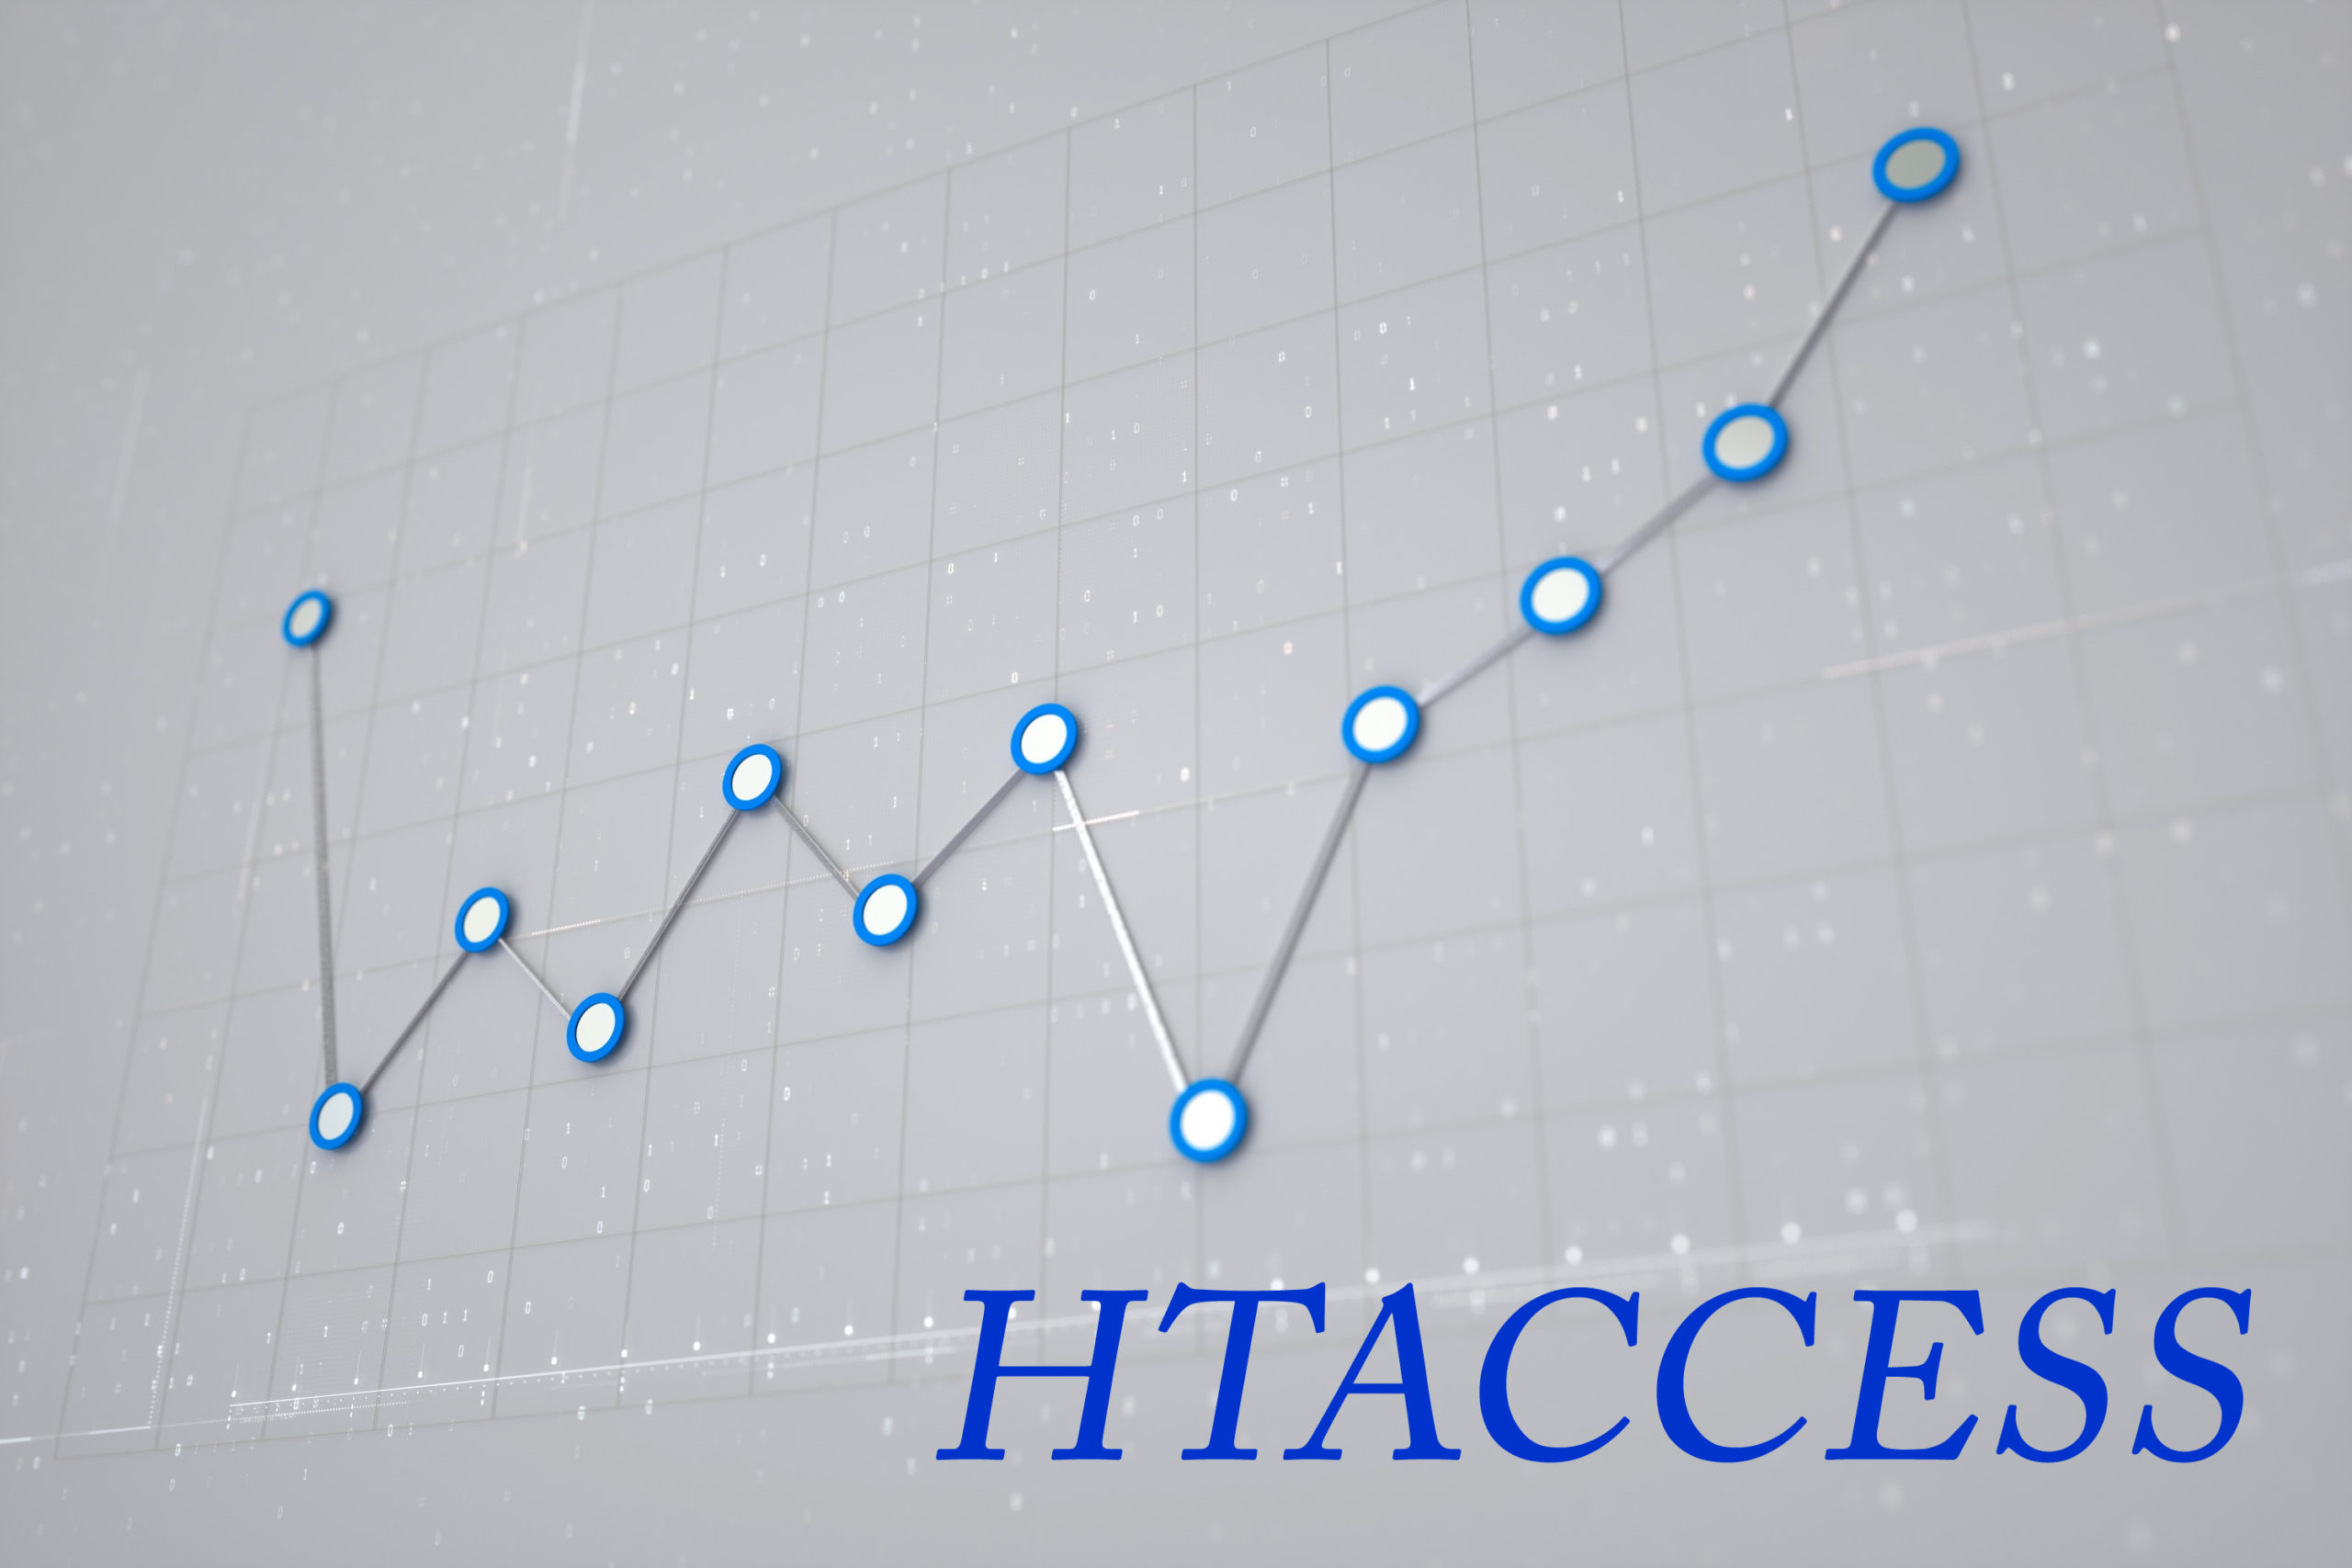 htaccessファイル変更時の注意点